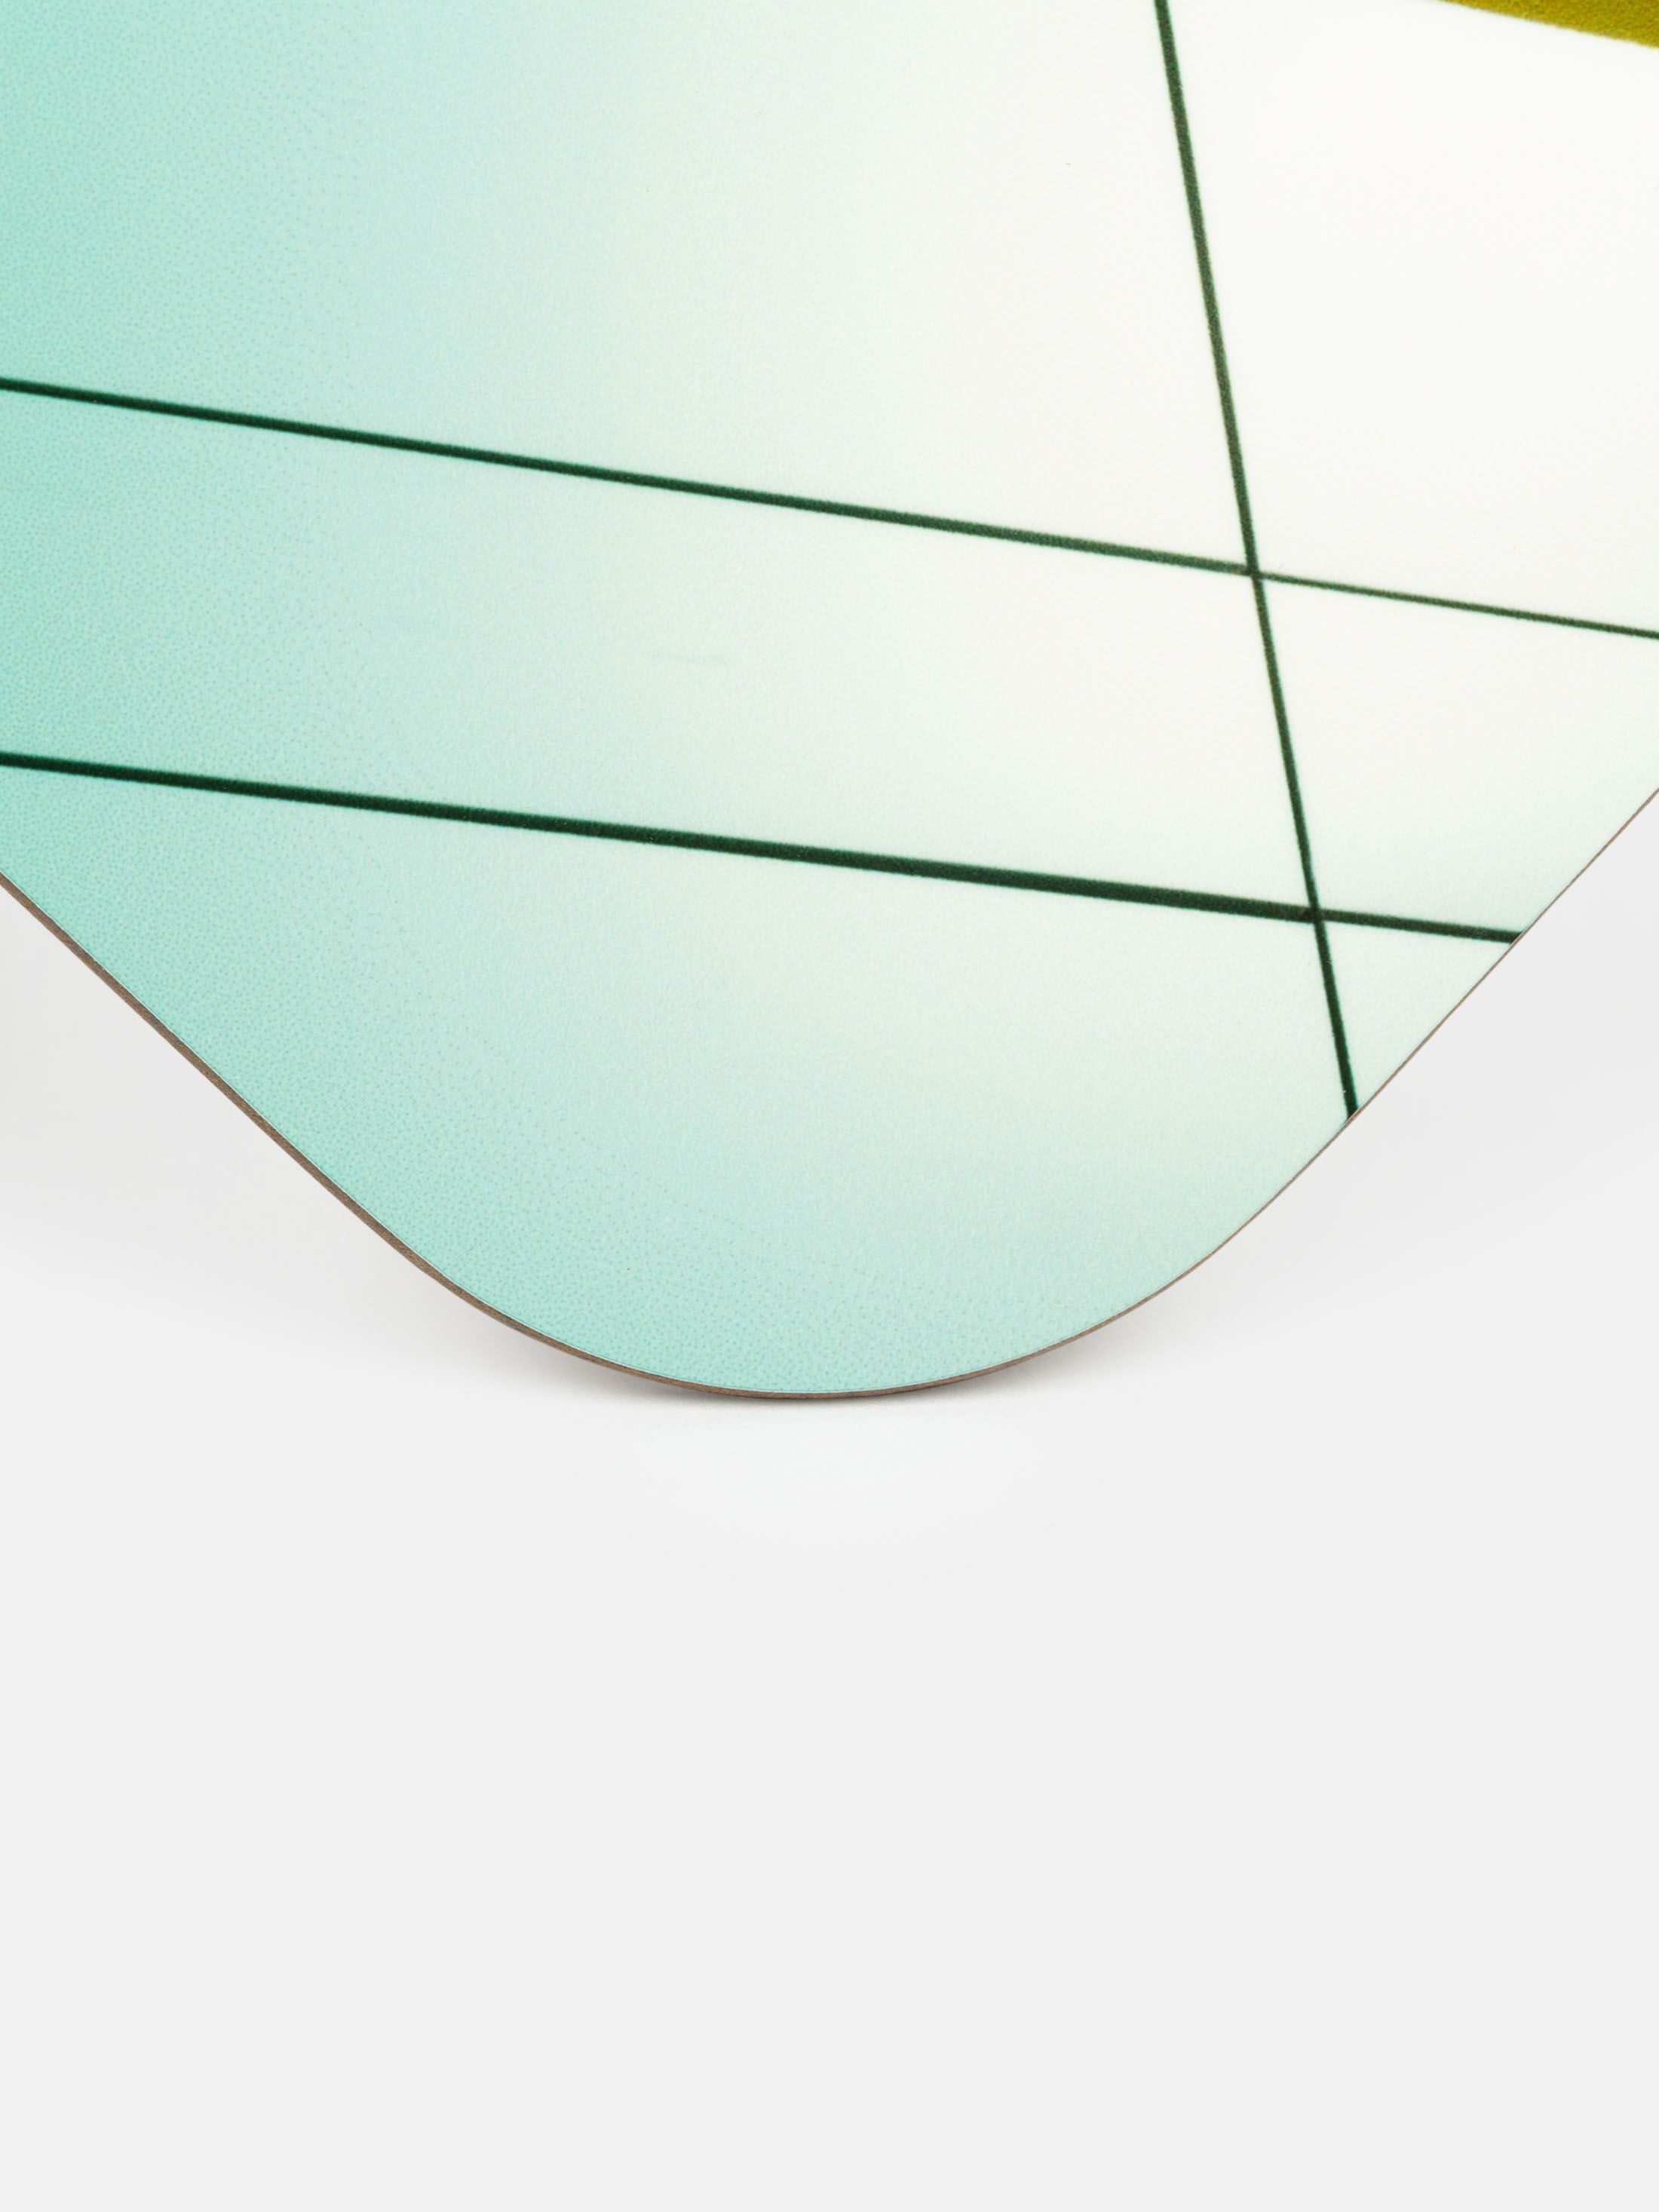 designa dina egna glasunderlägg